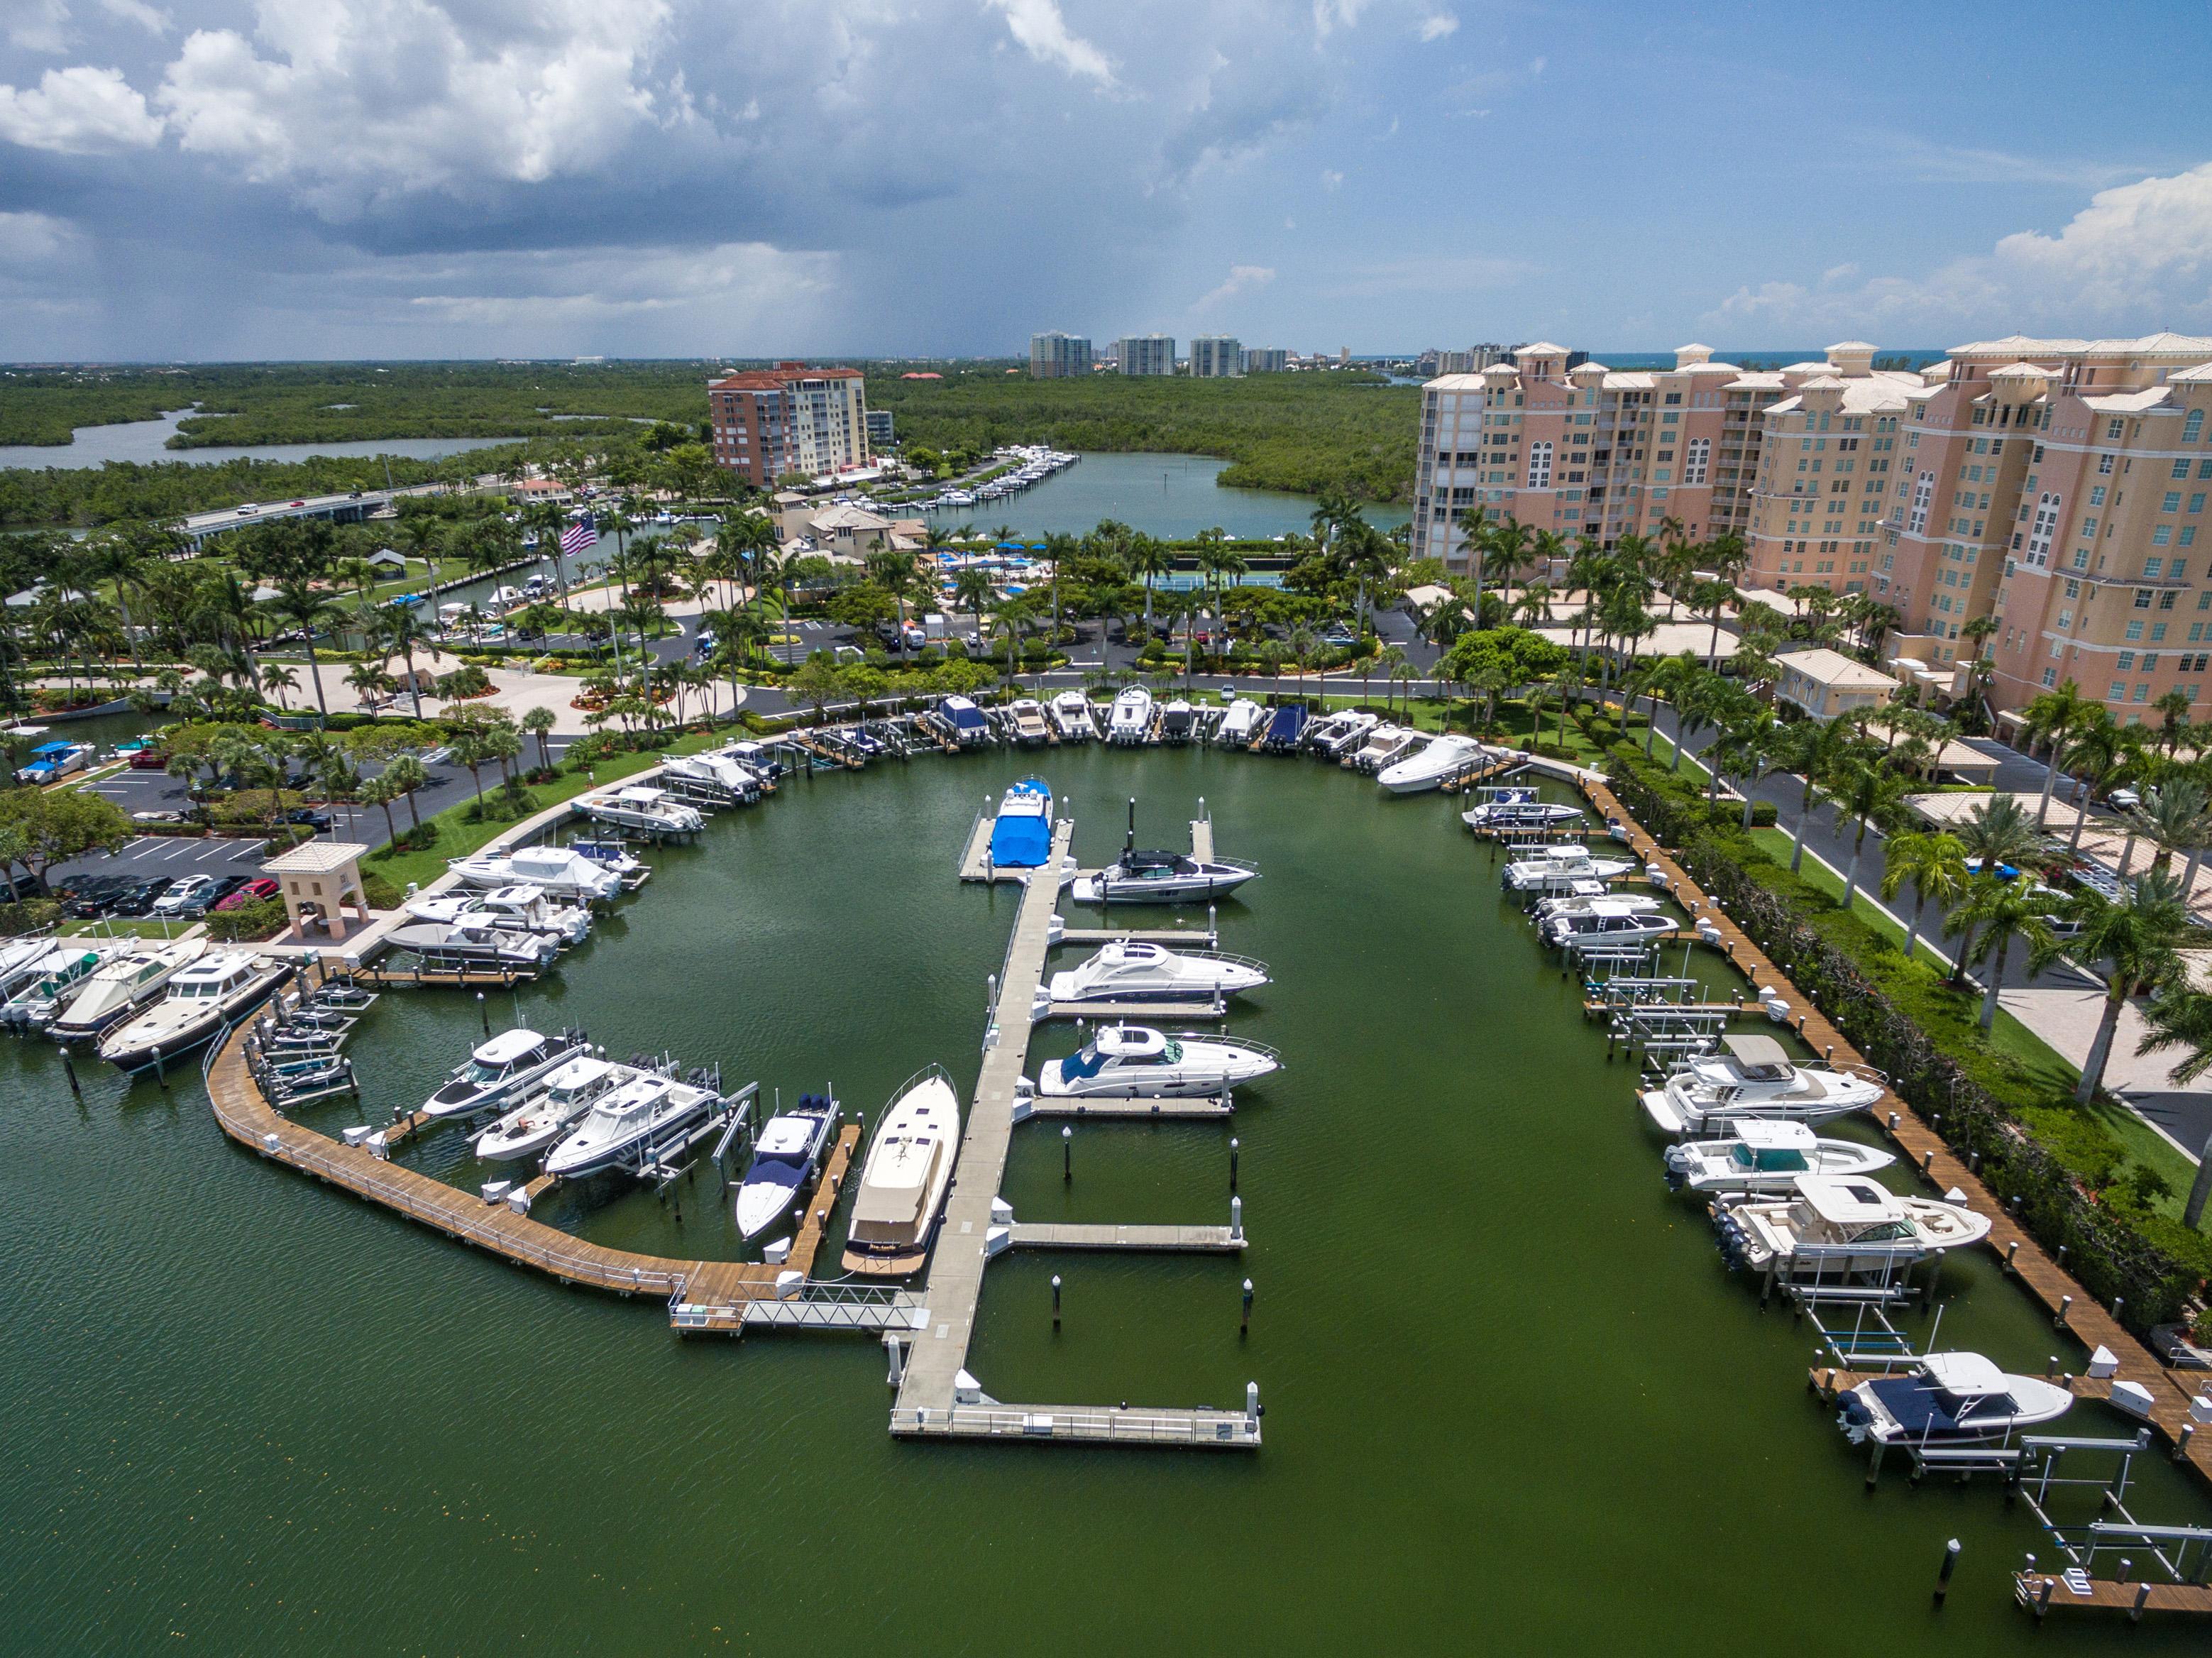 Marina At Pelican Isle Yacht Club Naples Fl Boat Slips Storage Private Island Club In Southwest Florida